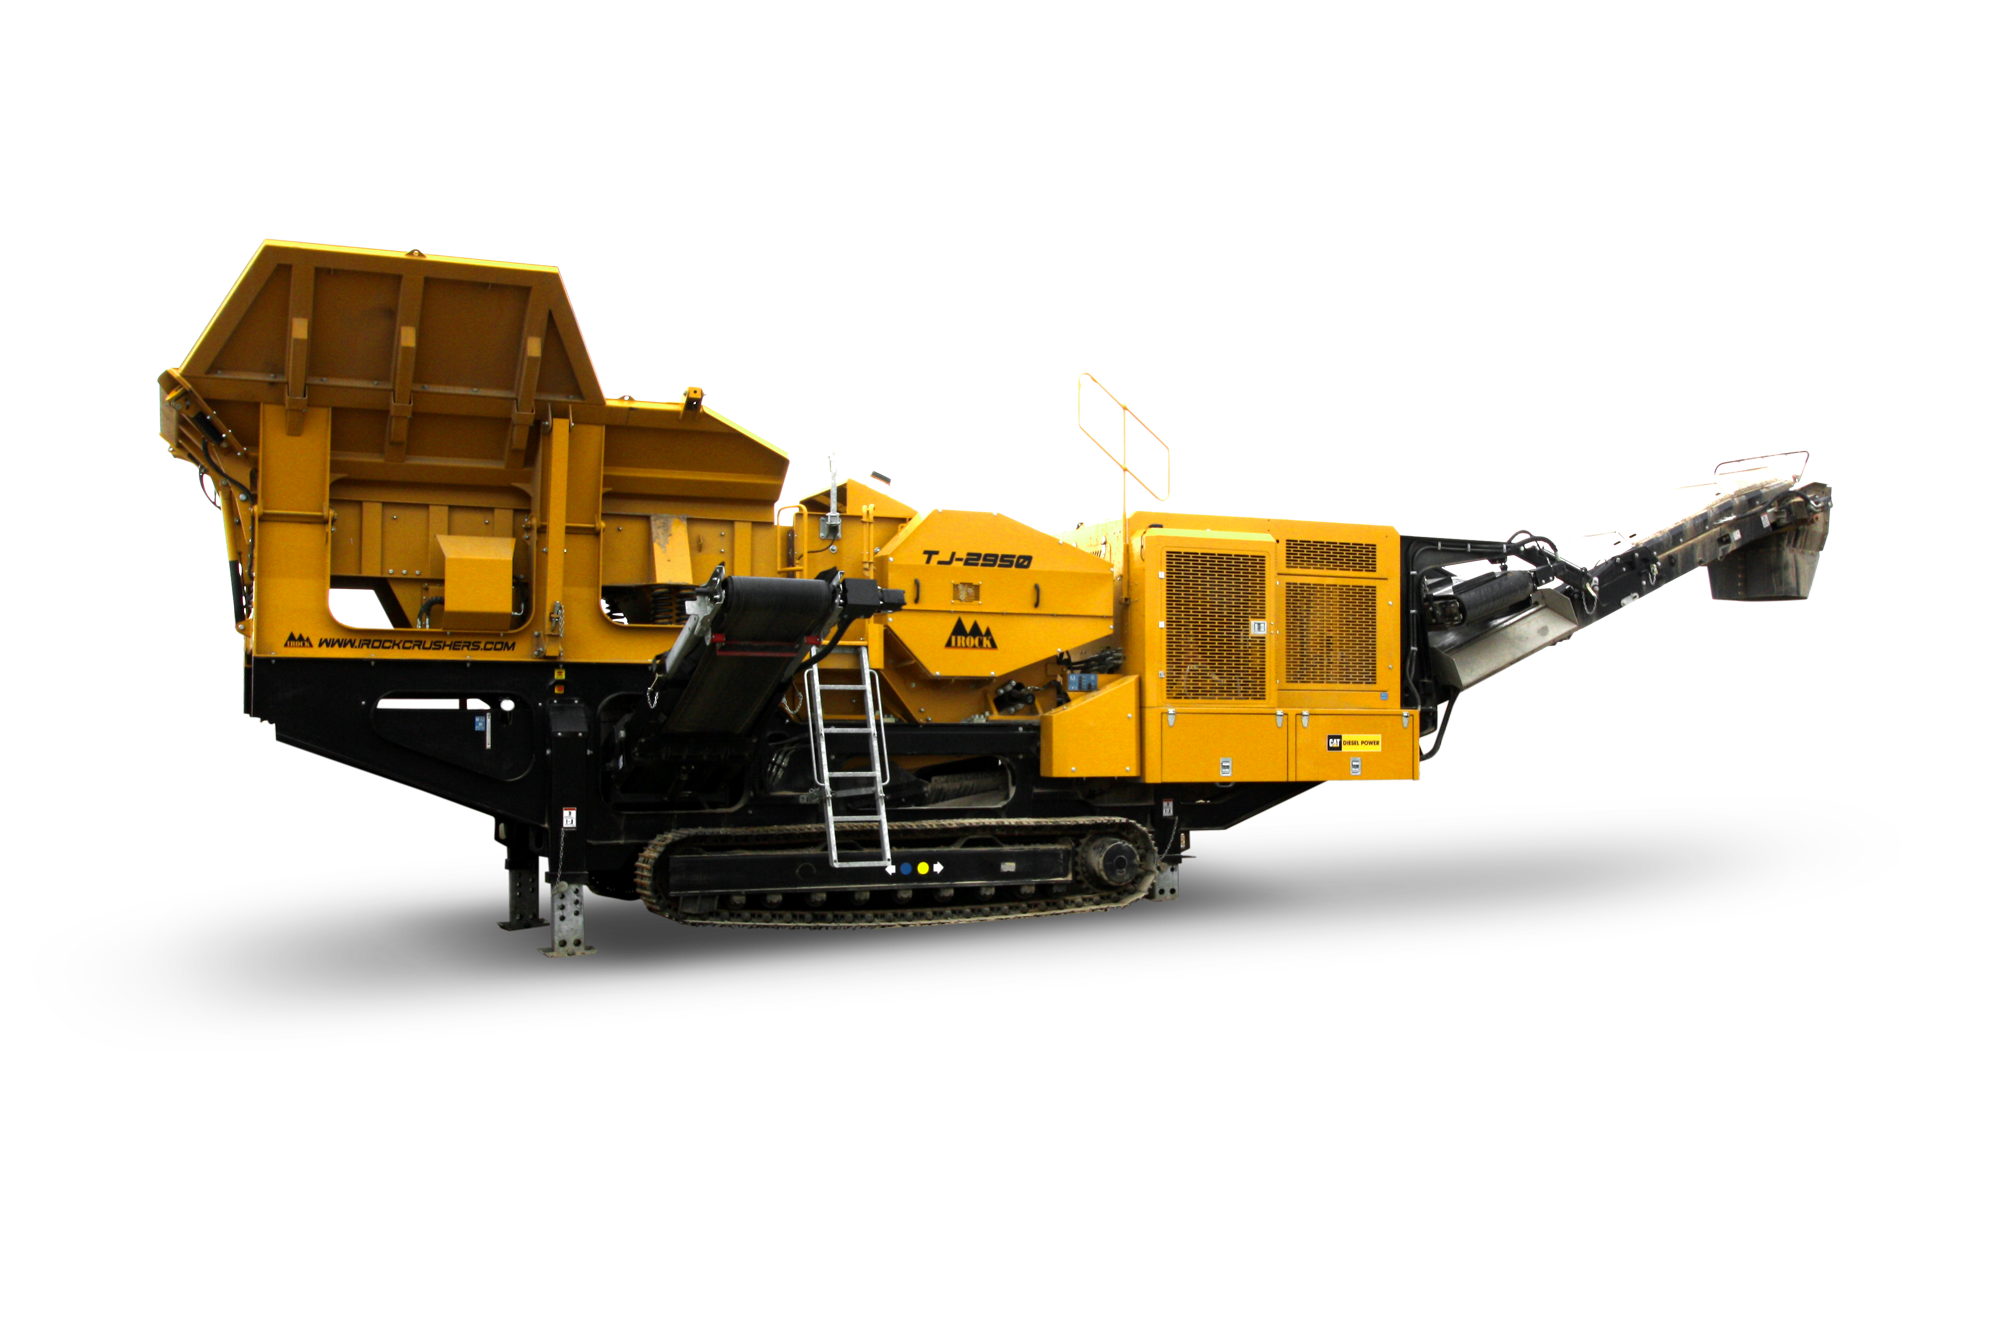 TJ-2950